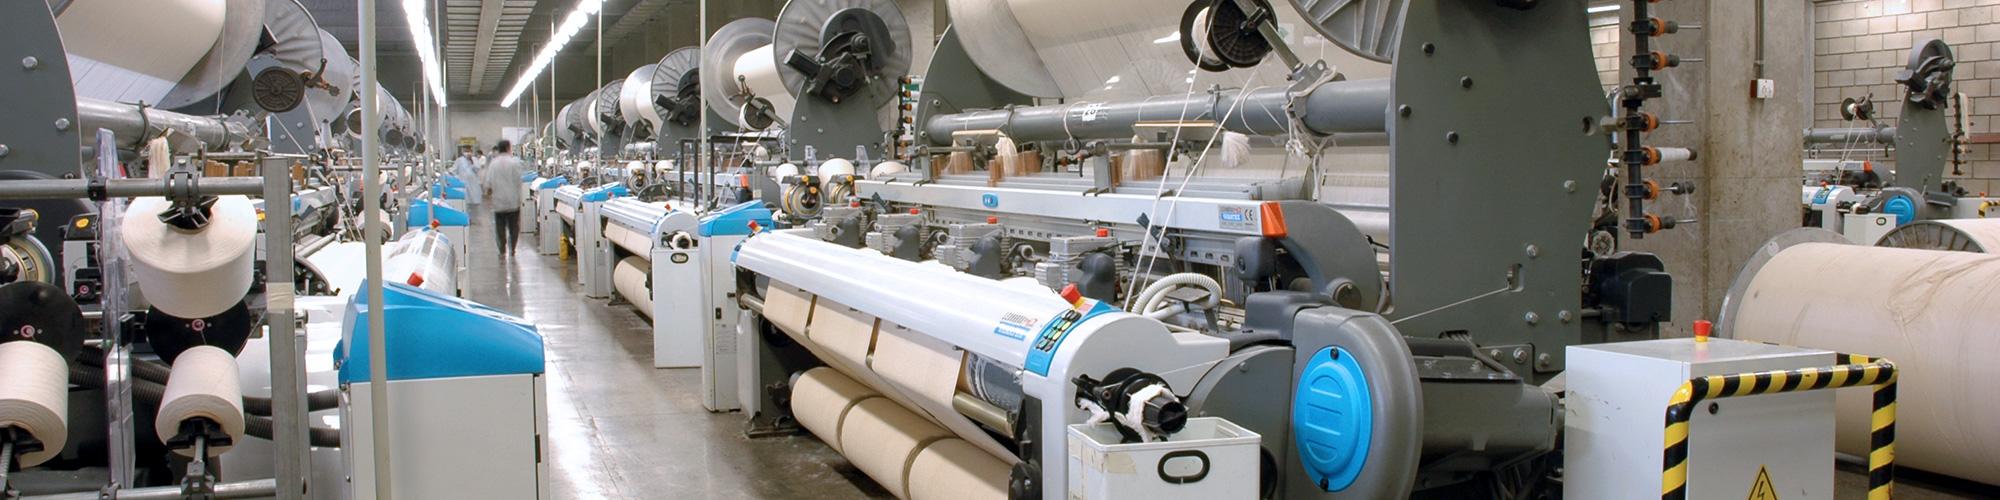 textile-manufacturing-plant